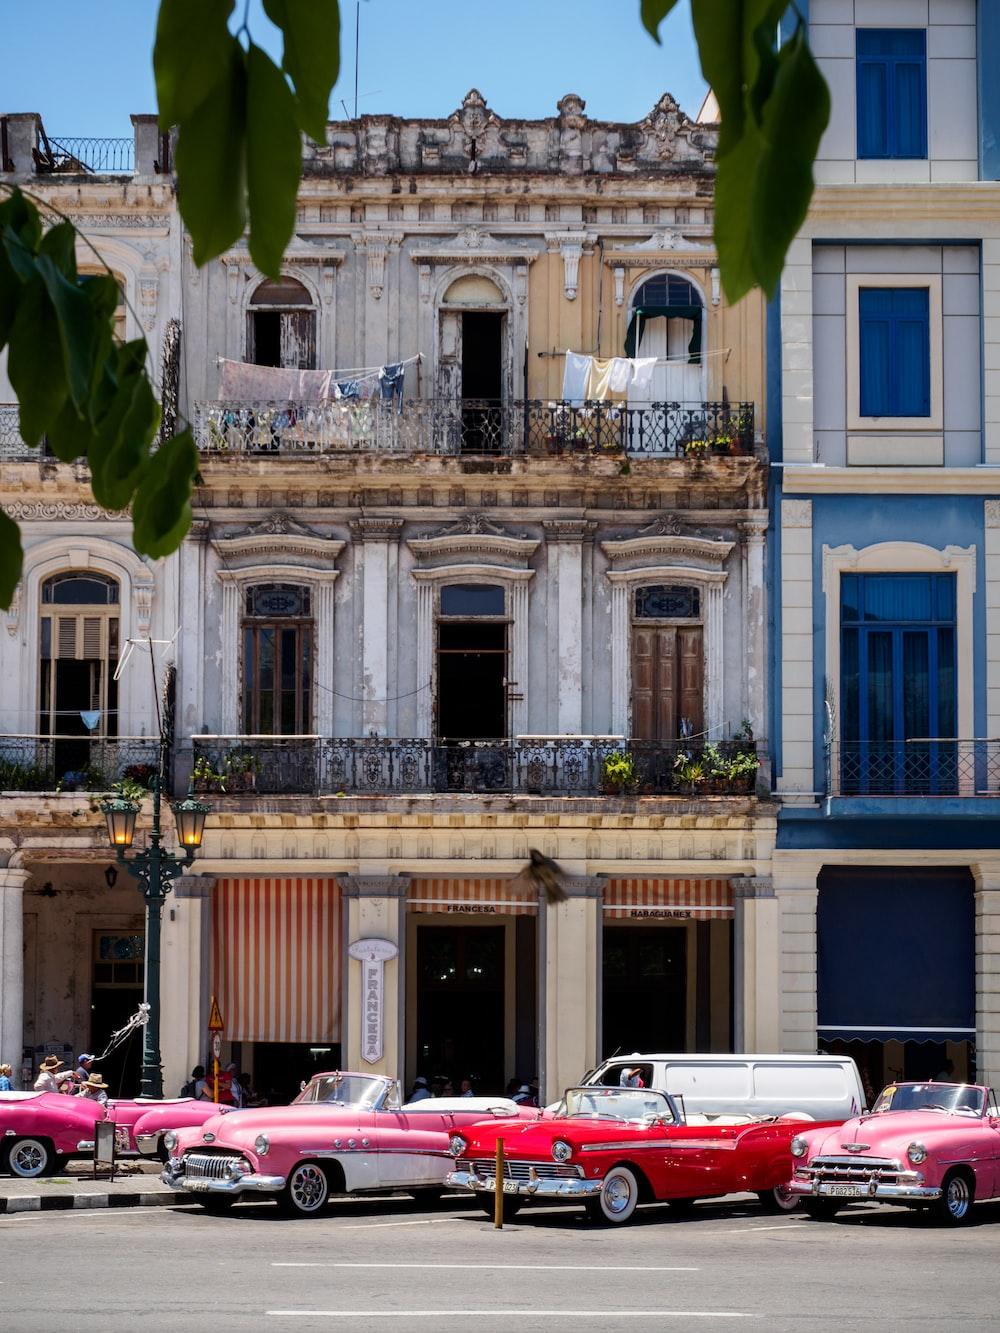 vehicle parked beside concrete buildings